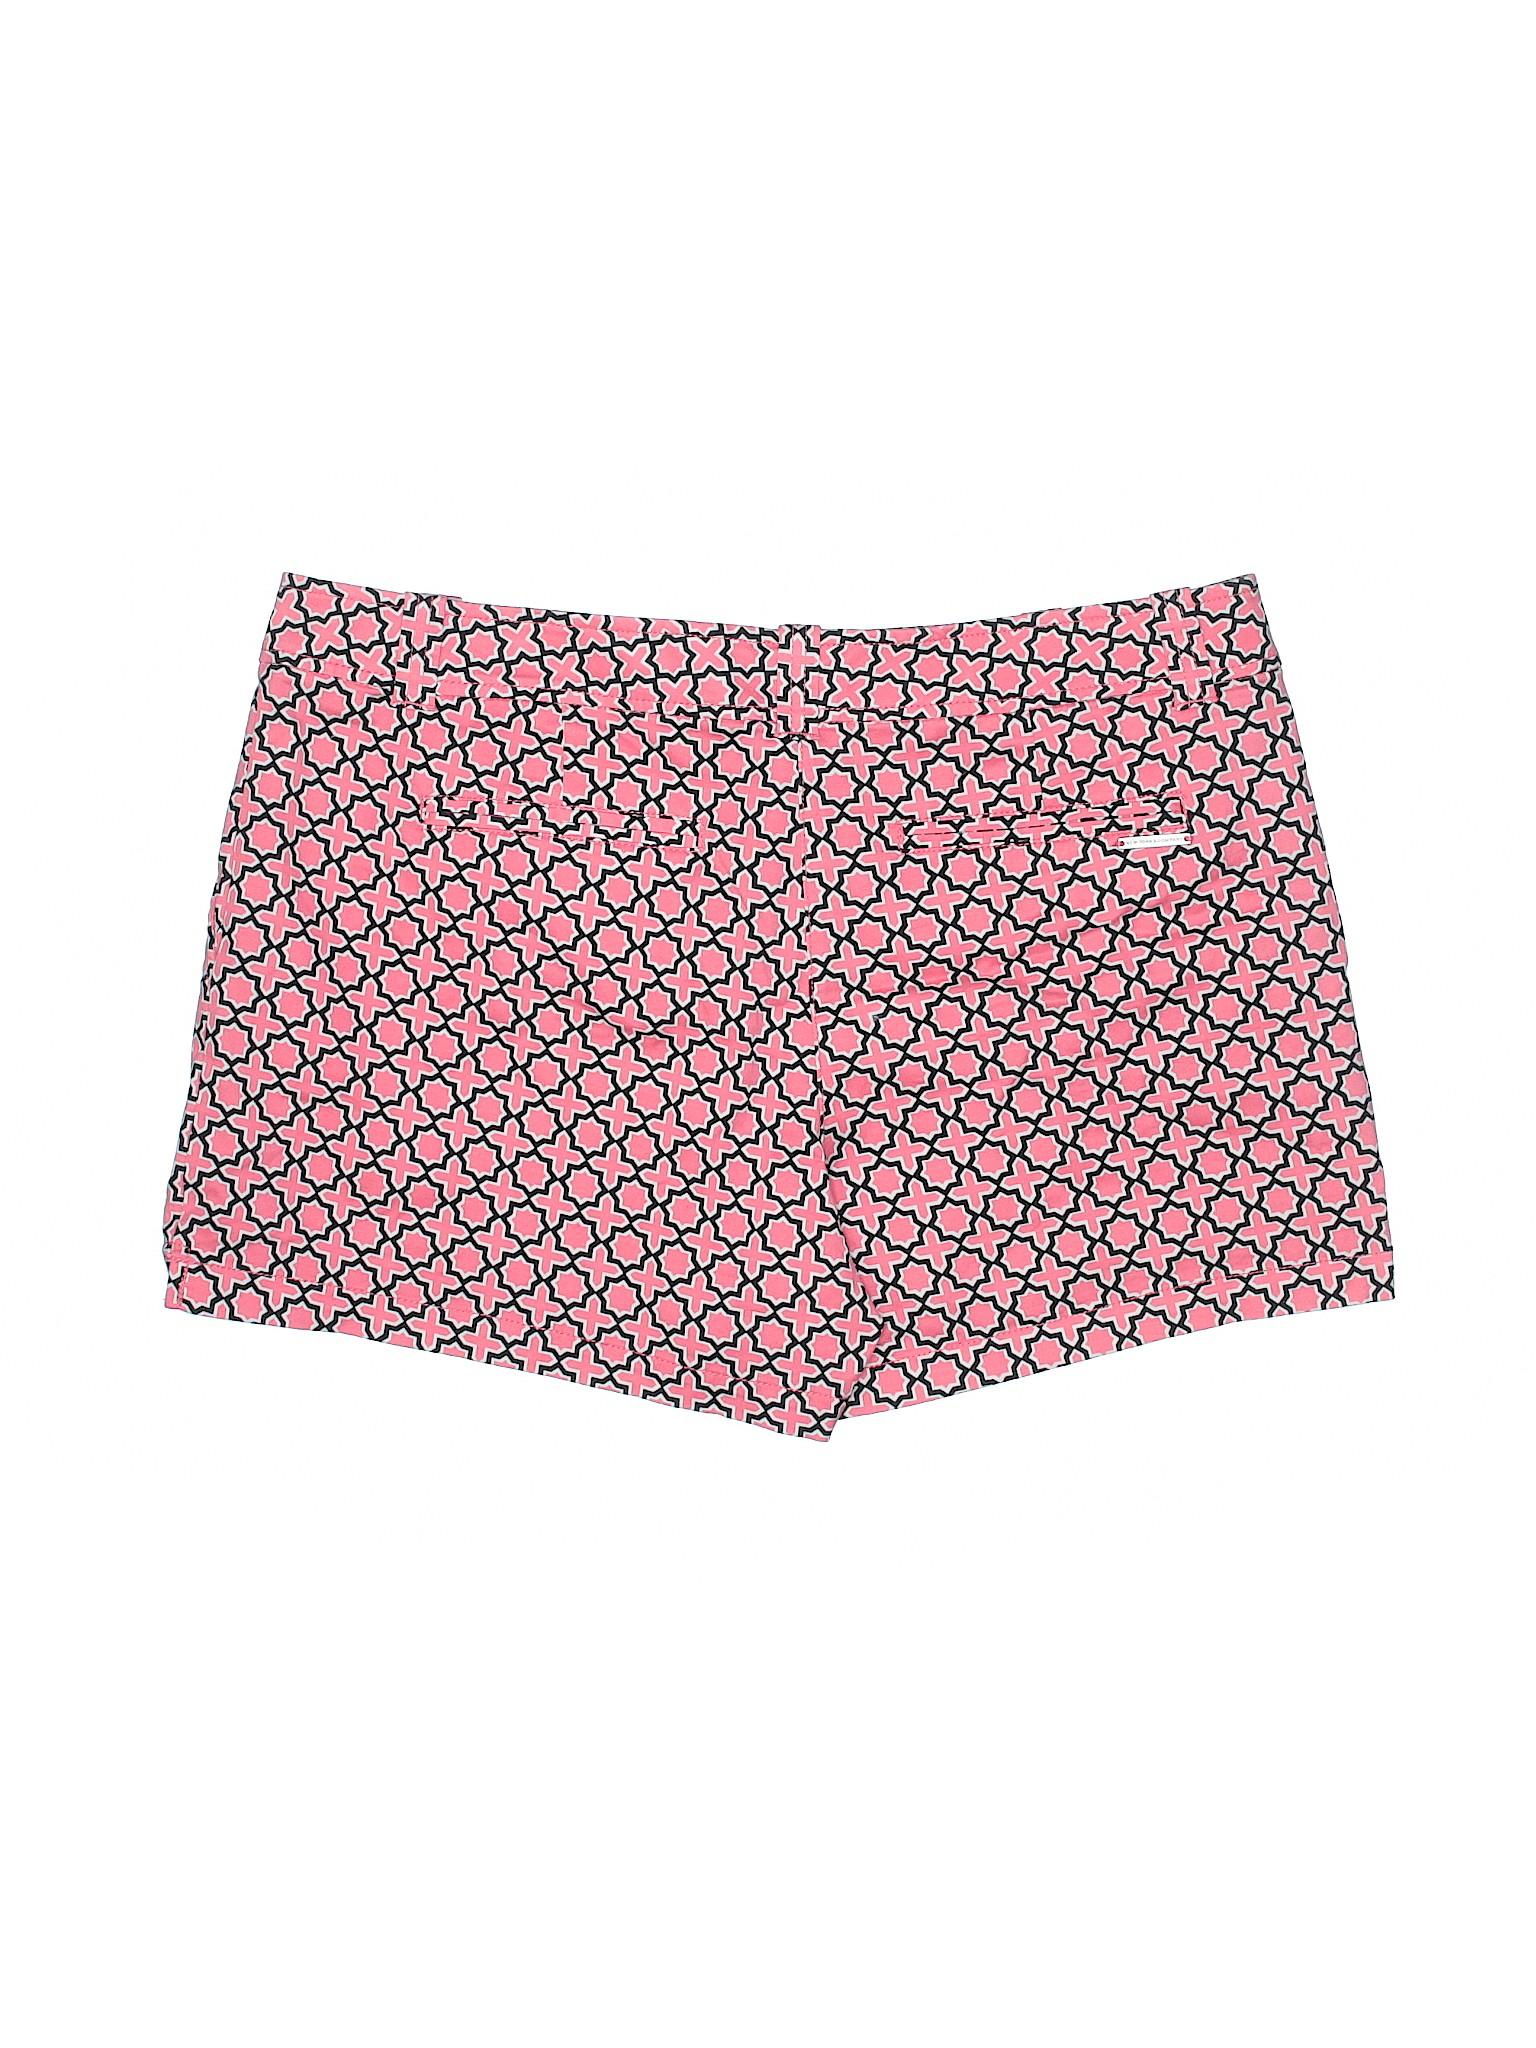 New Boutique Shorts Company amp; York 86wqO8na